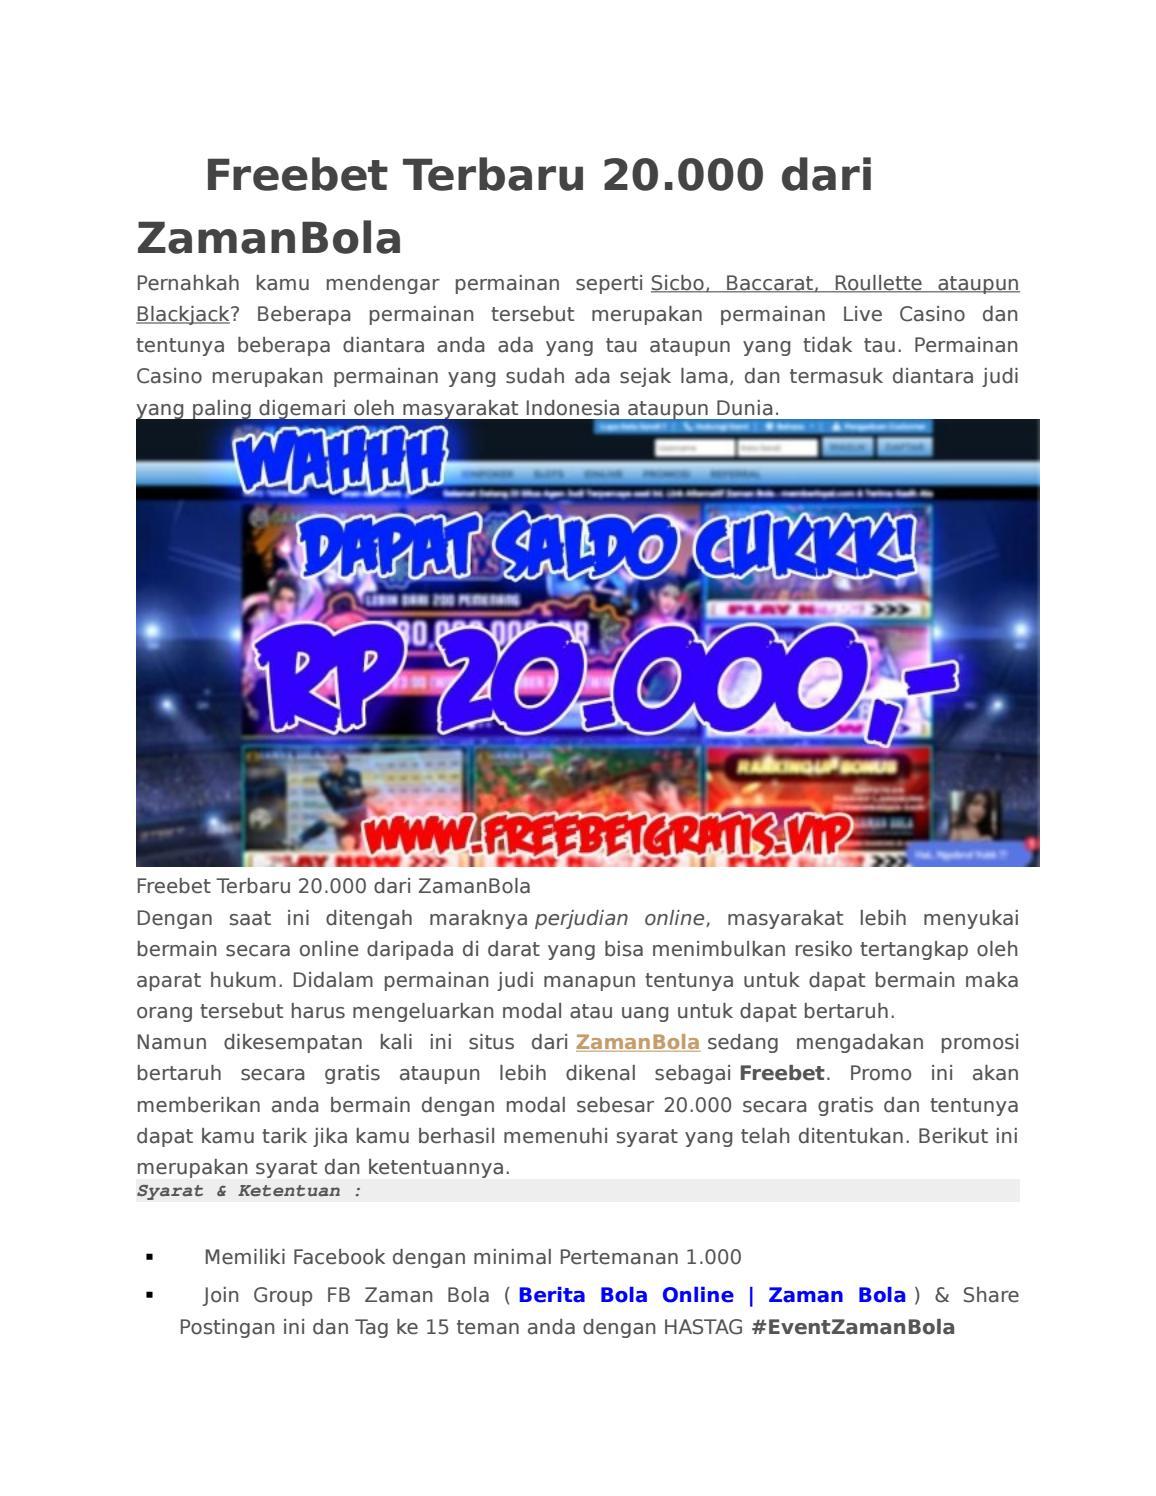 Freebet Terbaru 20 000 Dari Zamanbola By Freebet Terbaru Issuu